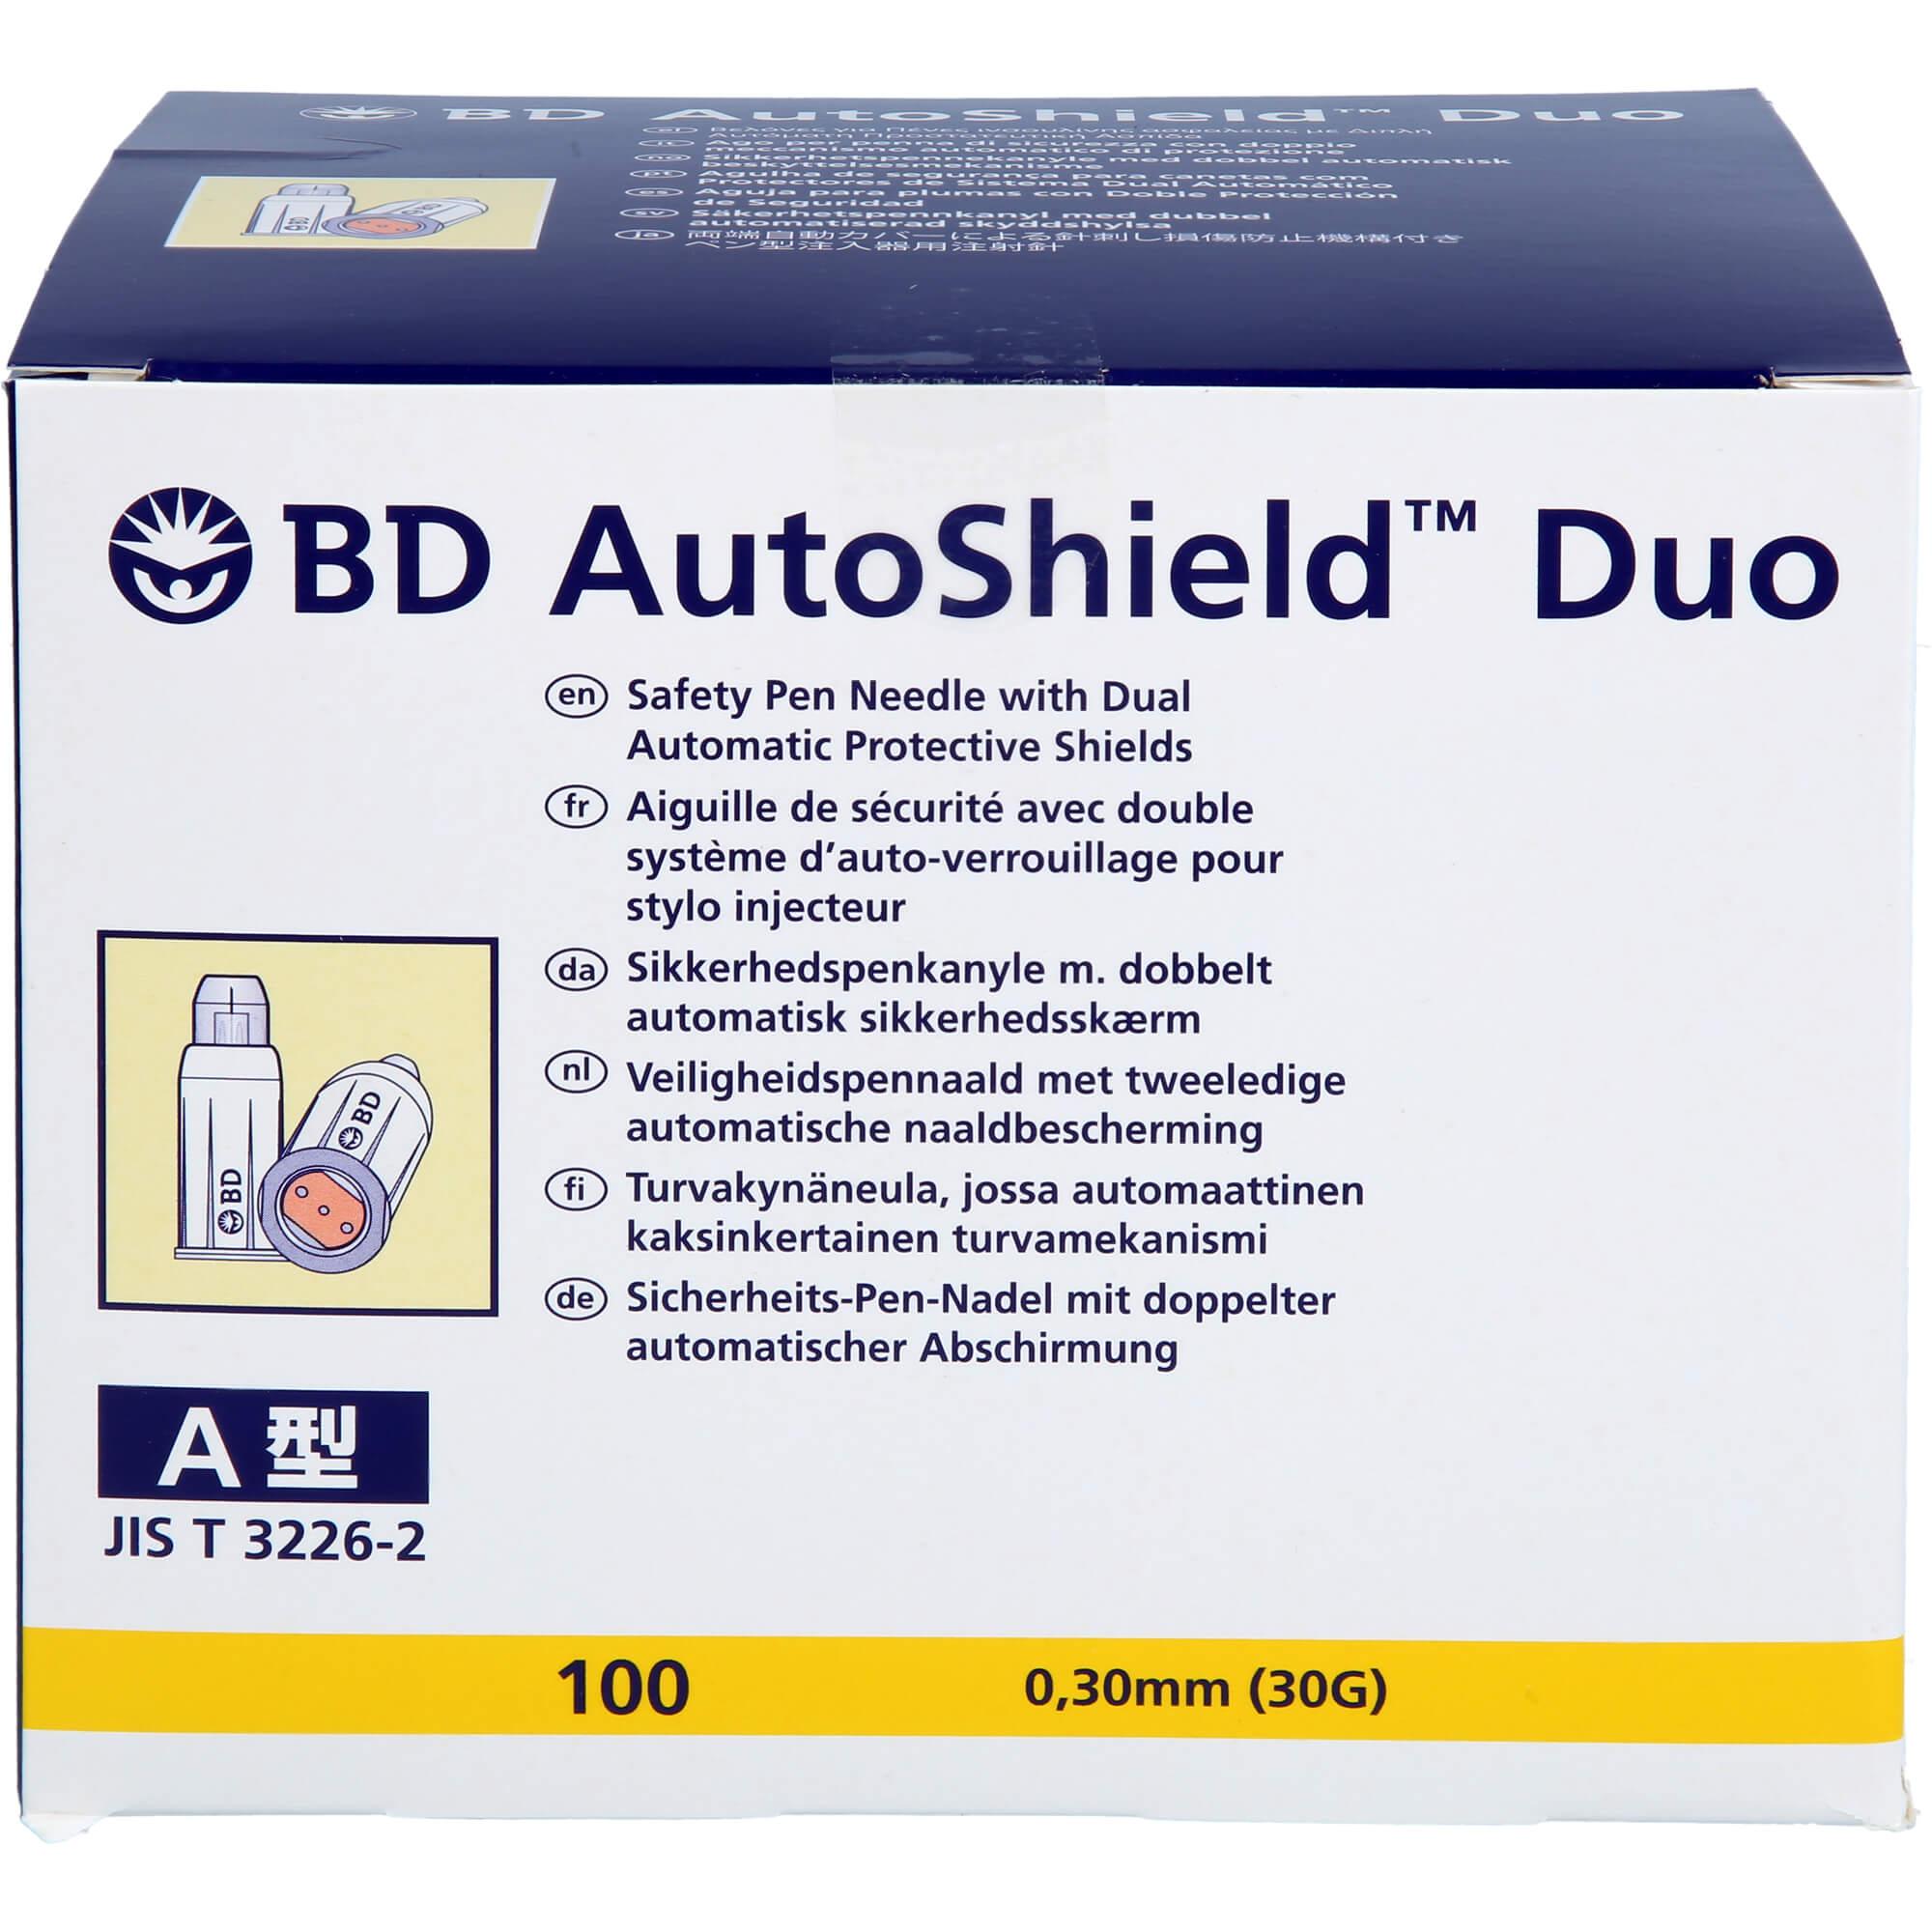 BD AUTOSHIELD Duo Sicherheits-Pen-Nadeln 8 mm